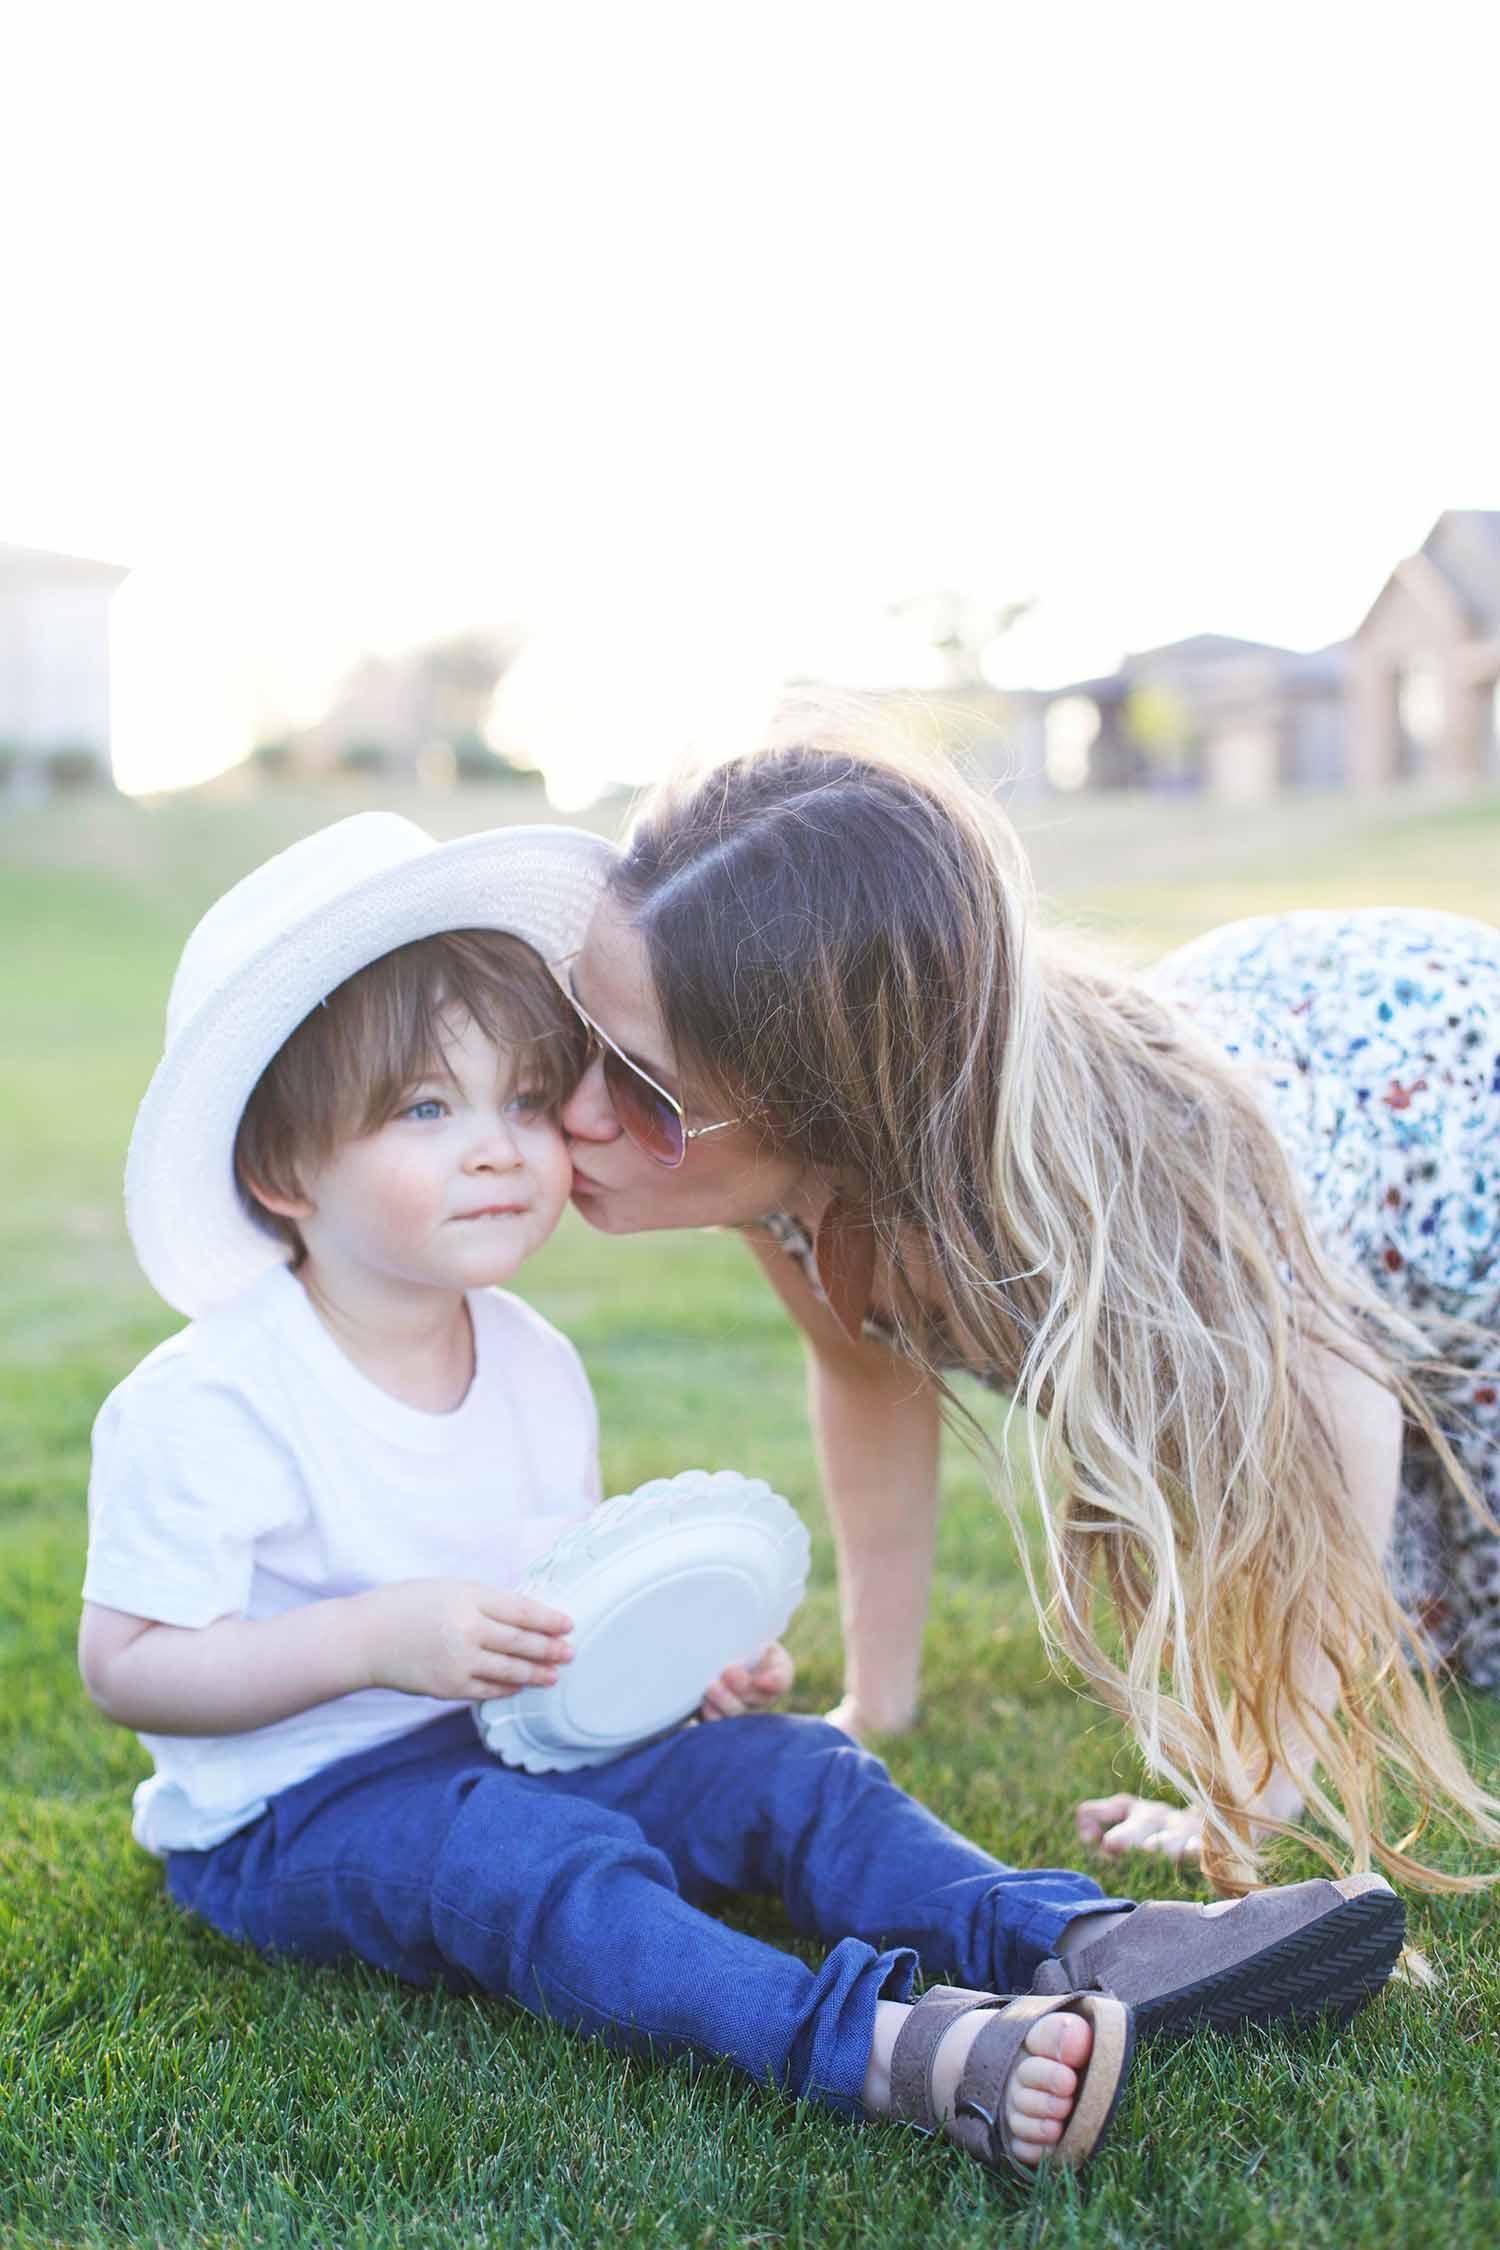 Easter picnic mom kissing son